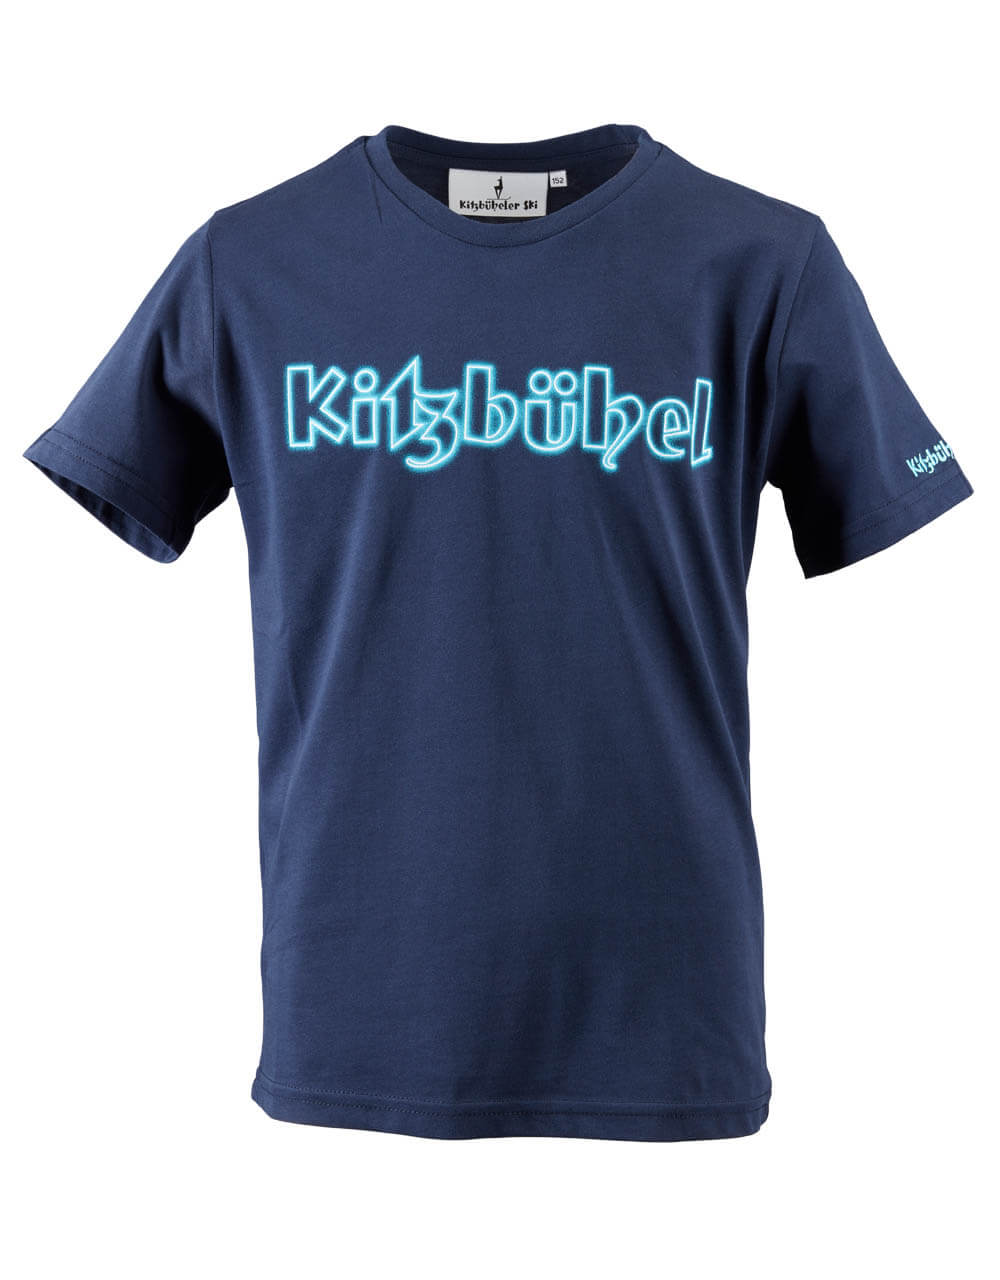 680101350 Kinder T-Shirt neon